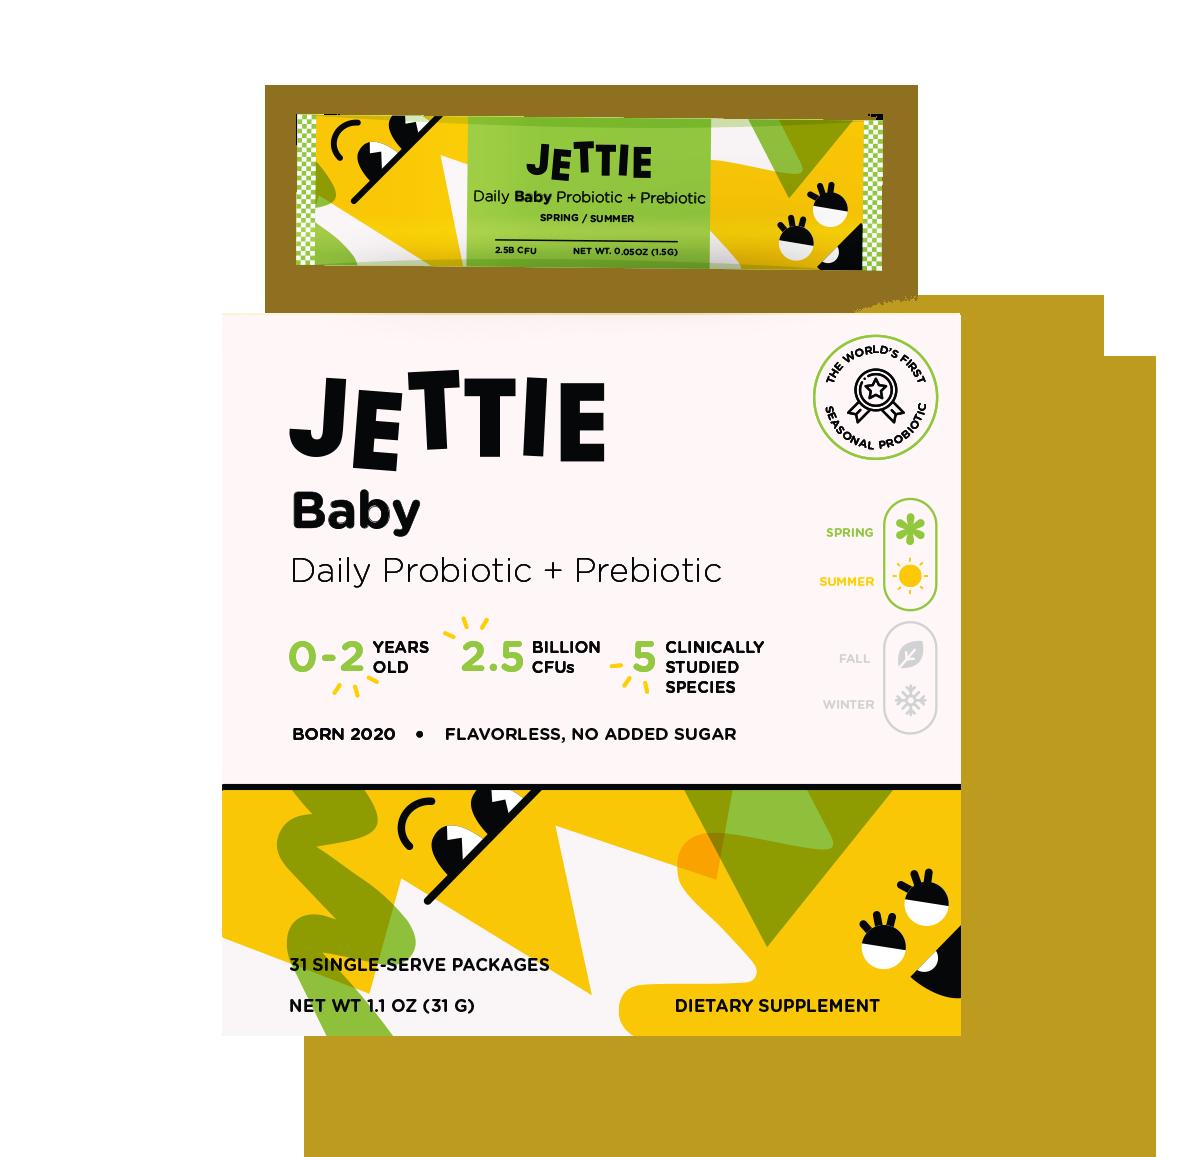 Jettie Baby Probiotic & Prebiotic